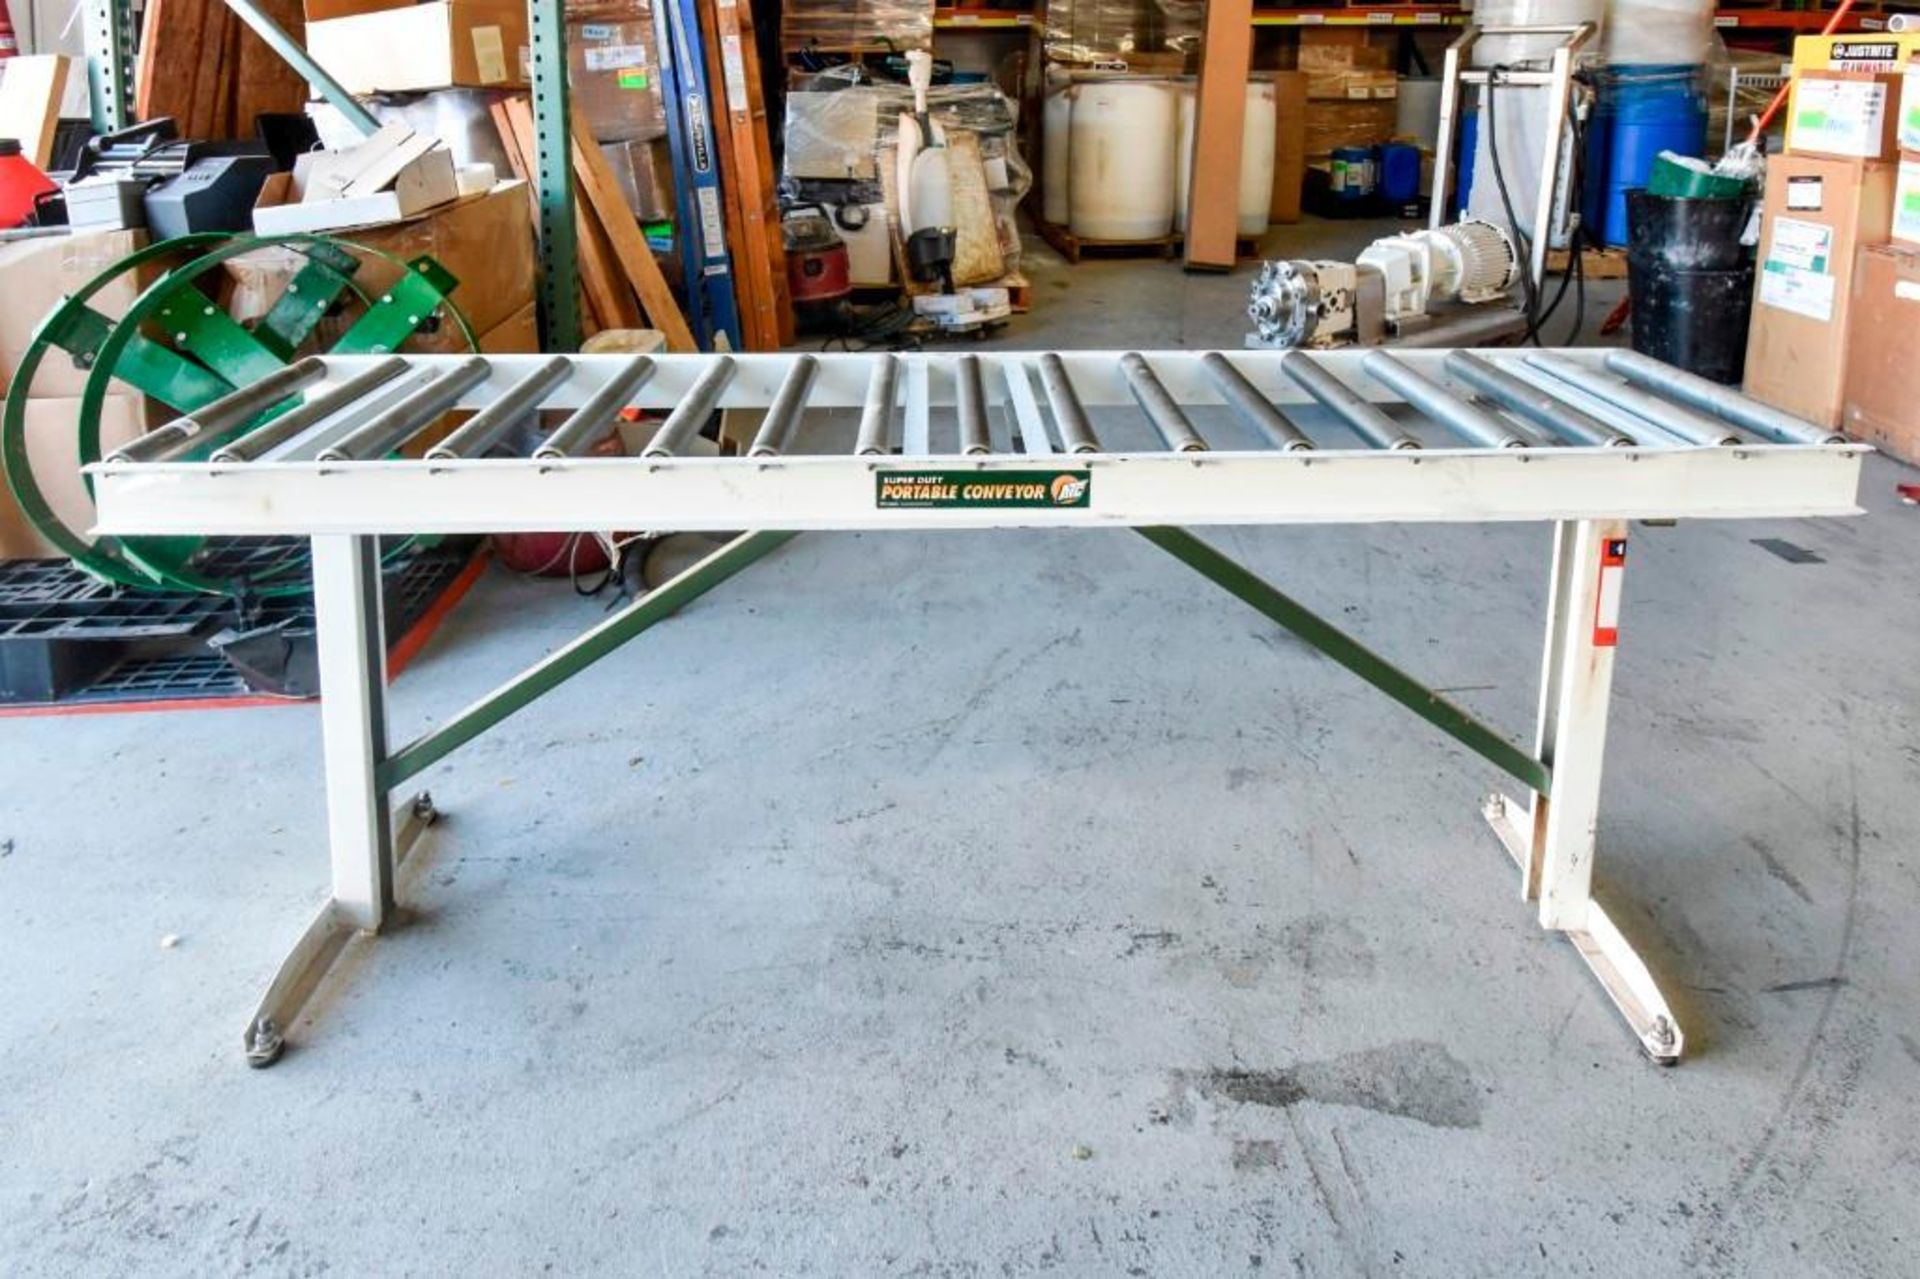 Super Duty Portable Folding Roller Conveyor 5'7''